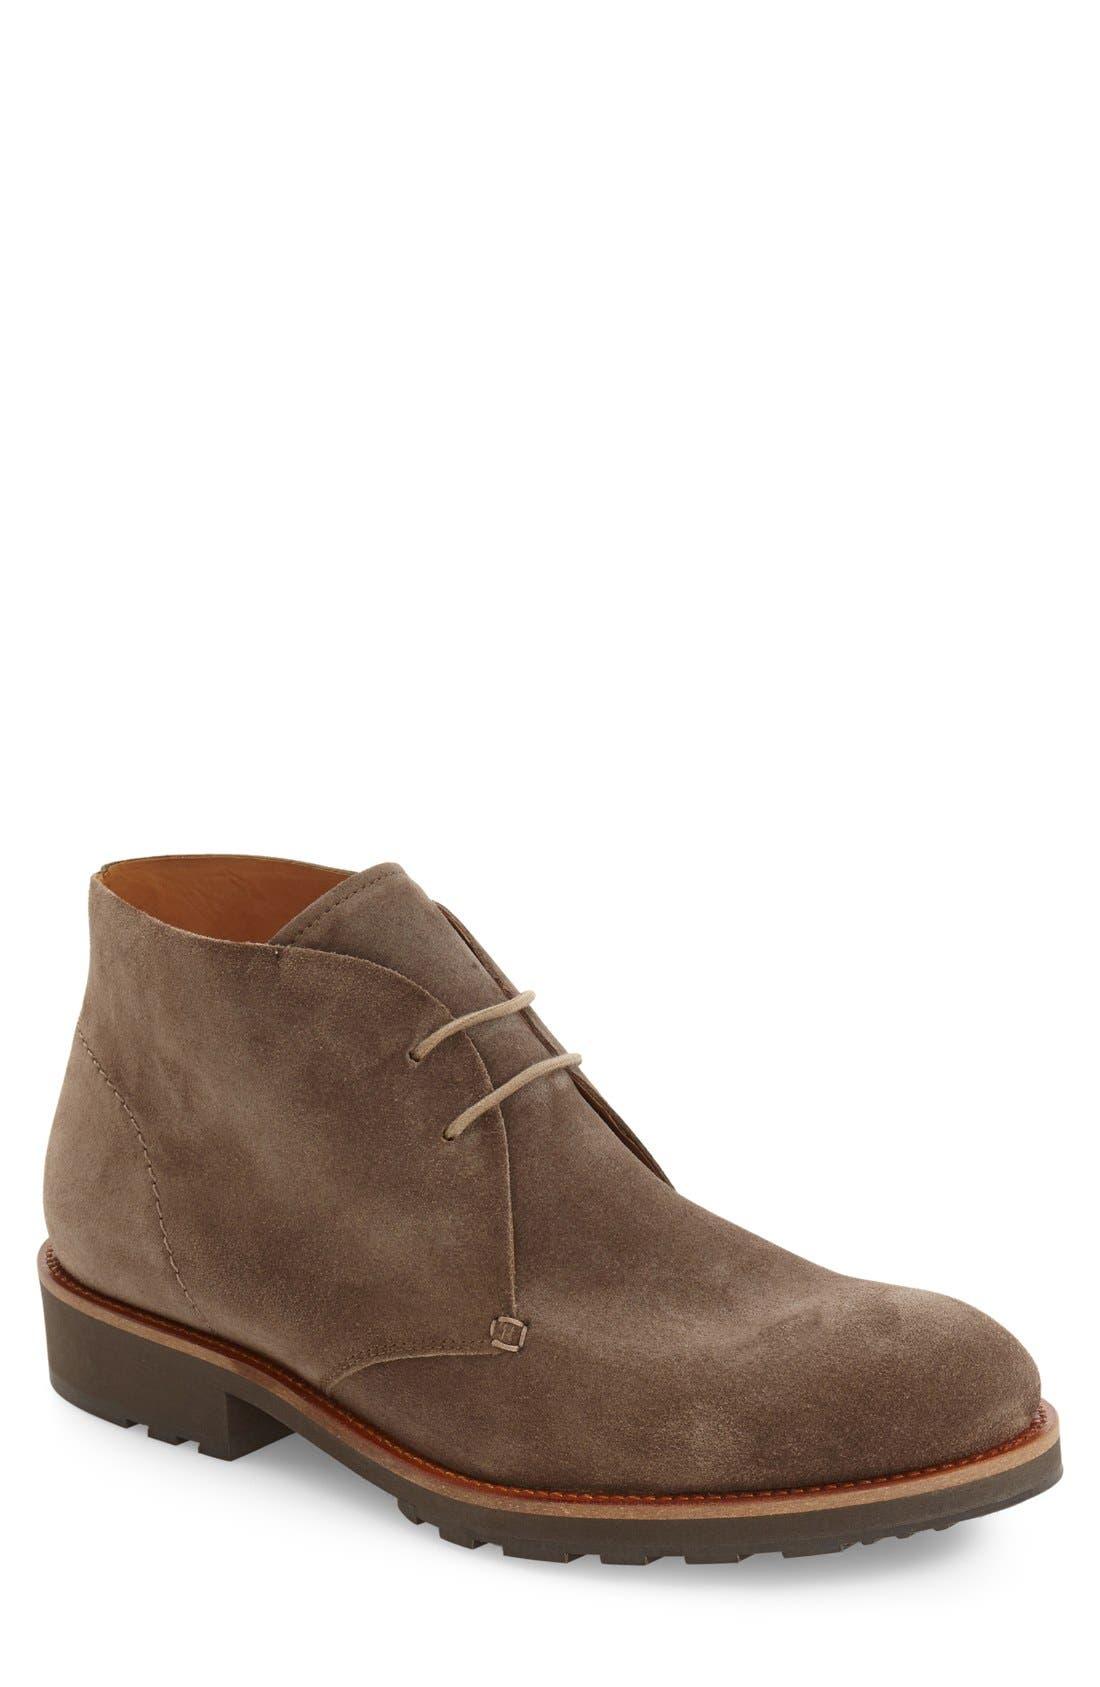 'Ardo' Chukka Boot,                         Main,                         color, 200